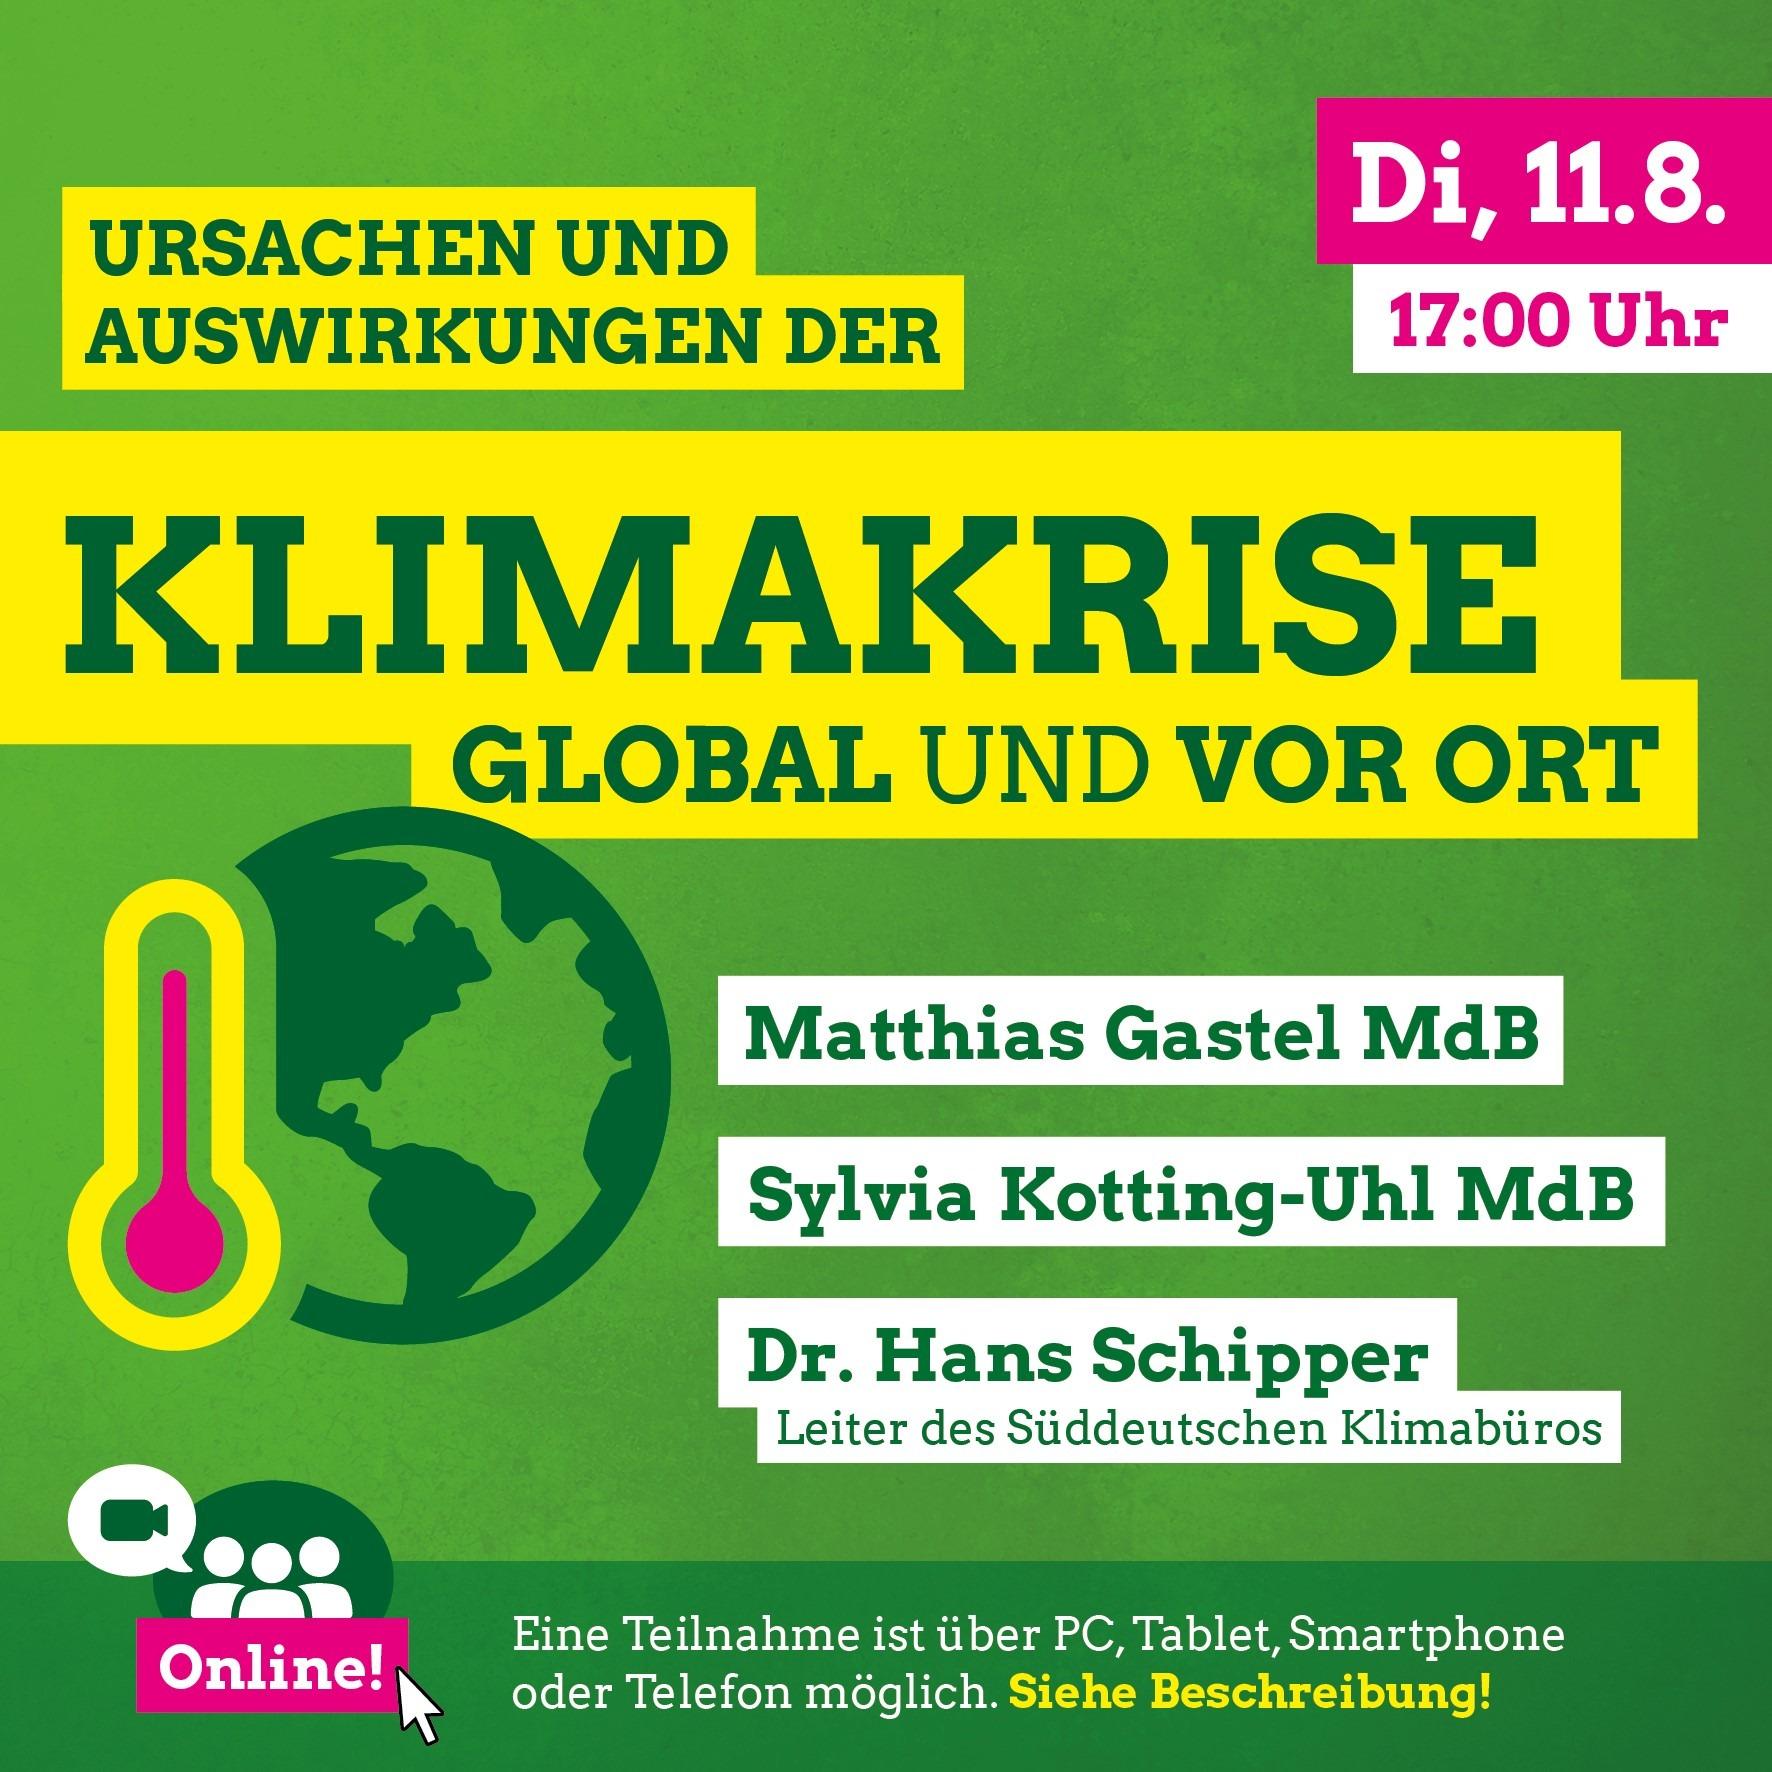 11.08.2020: Online-Gespräch mit Sylvia Kotting-Uhl MdB, Matthias Gastel MdB und dem Meteorologen Dr. Hans Schipper